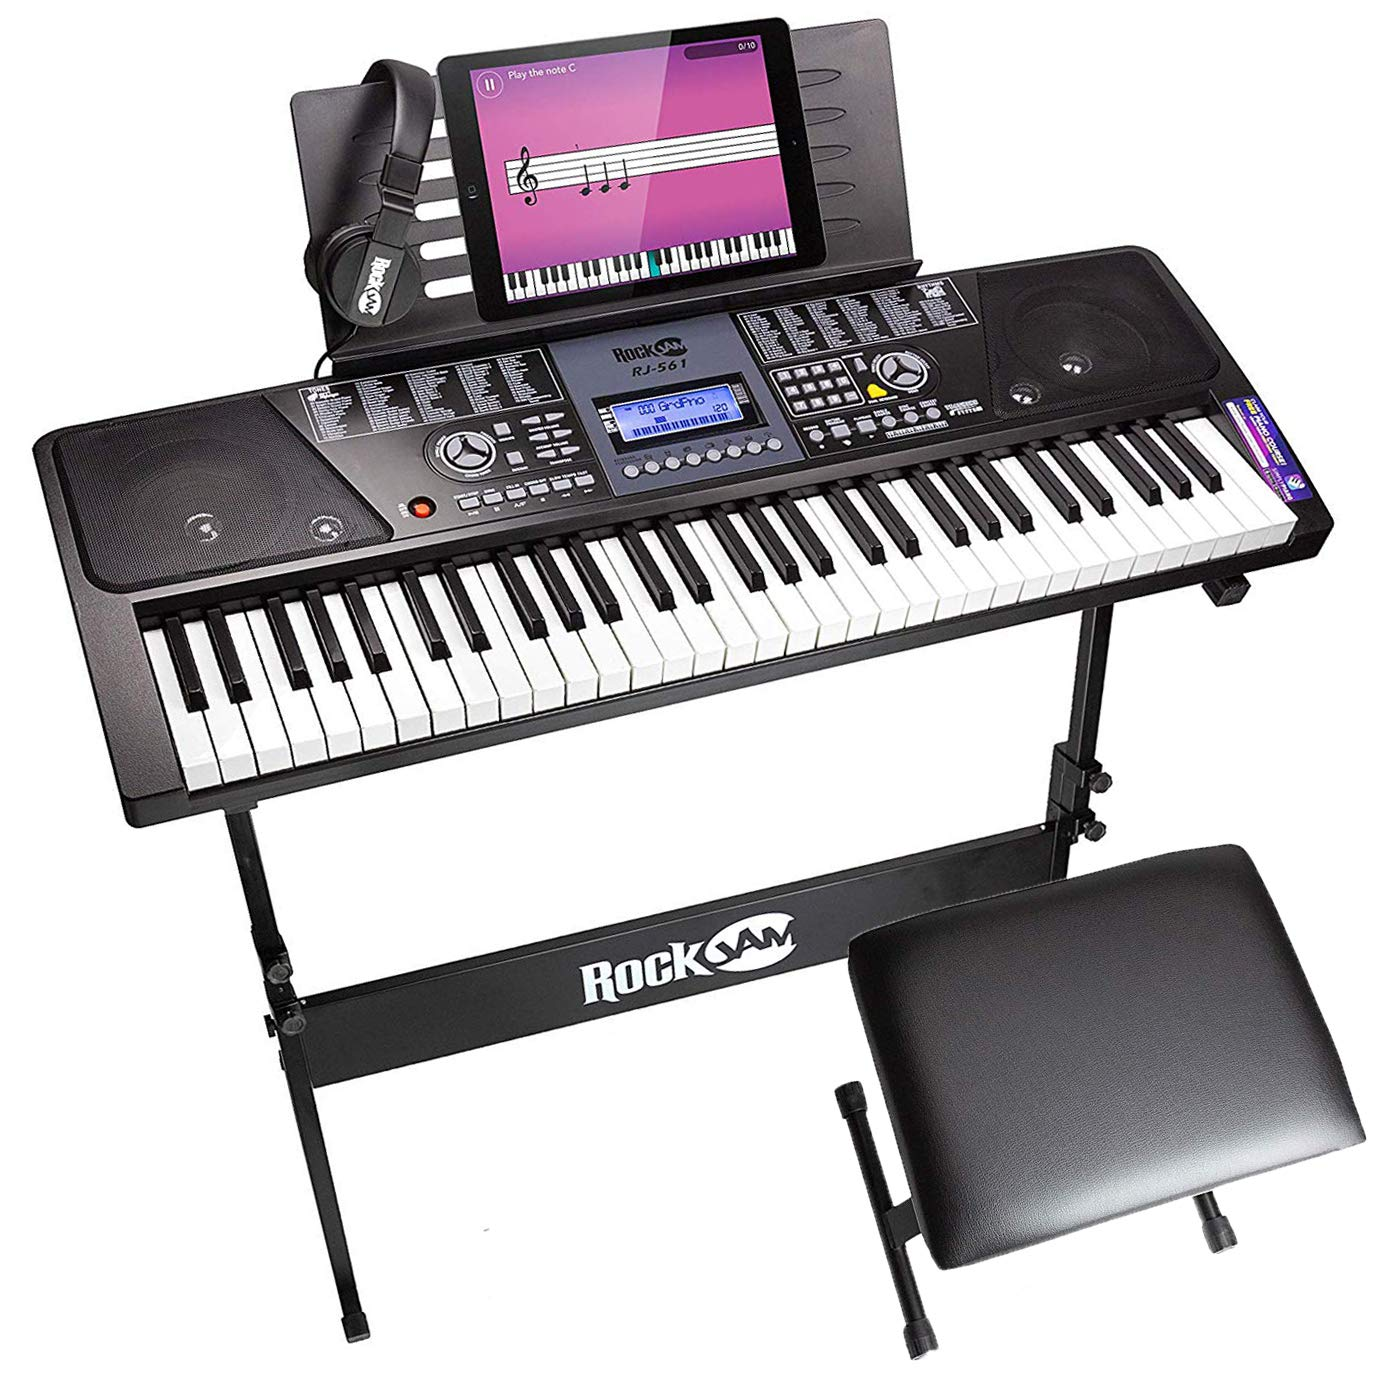 RockJam Electronic Keyboard SuperKit Headphones